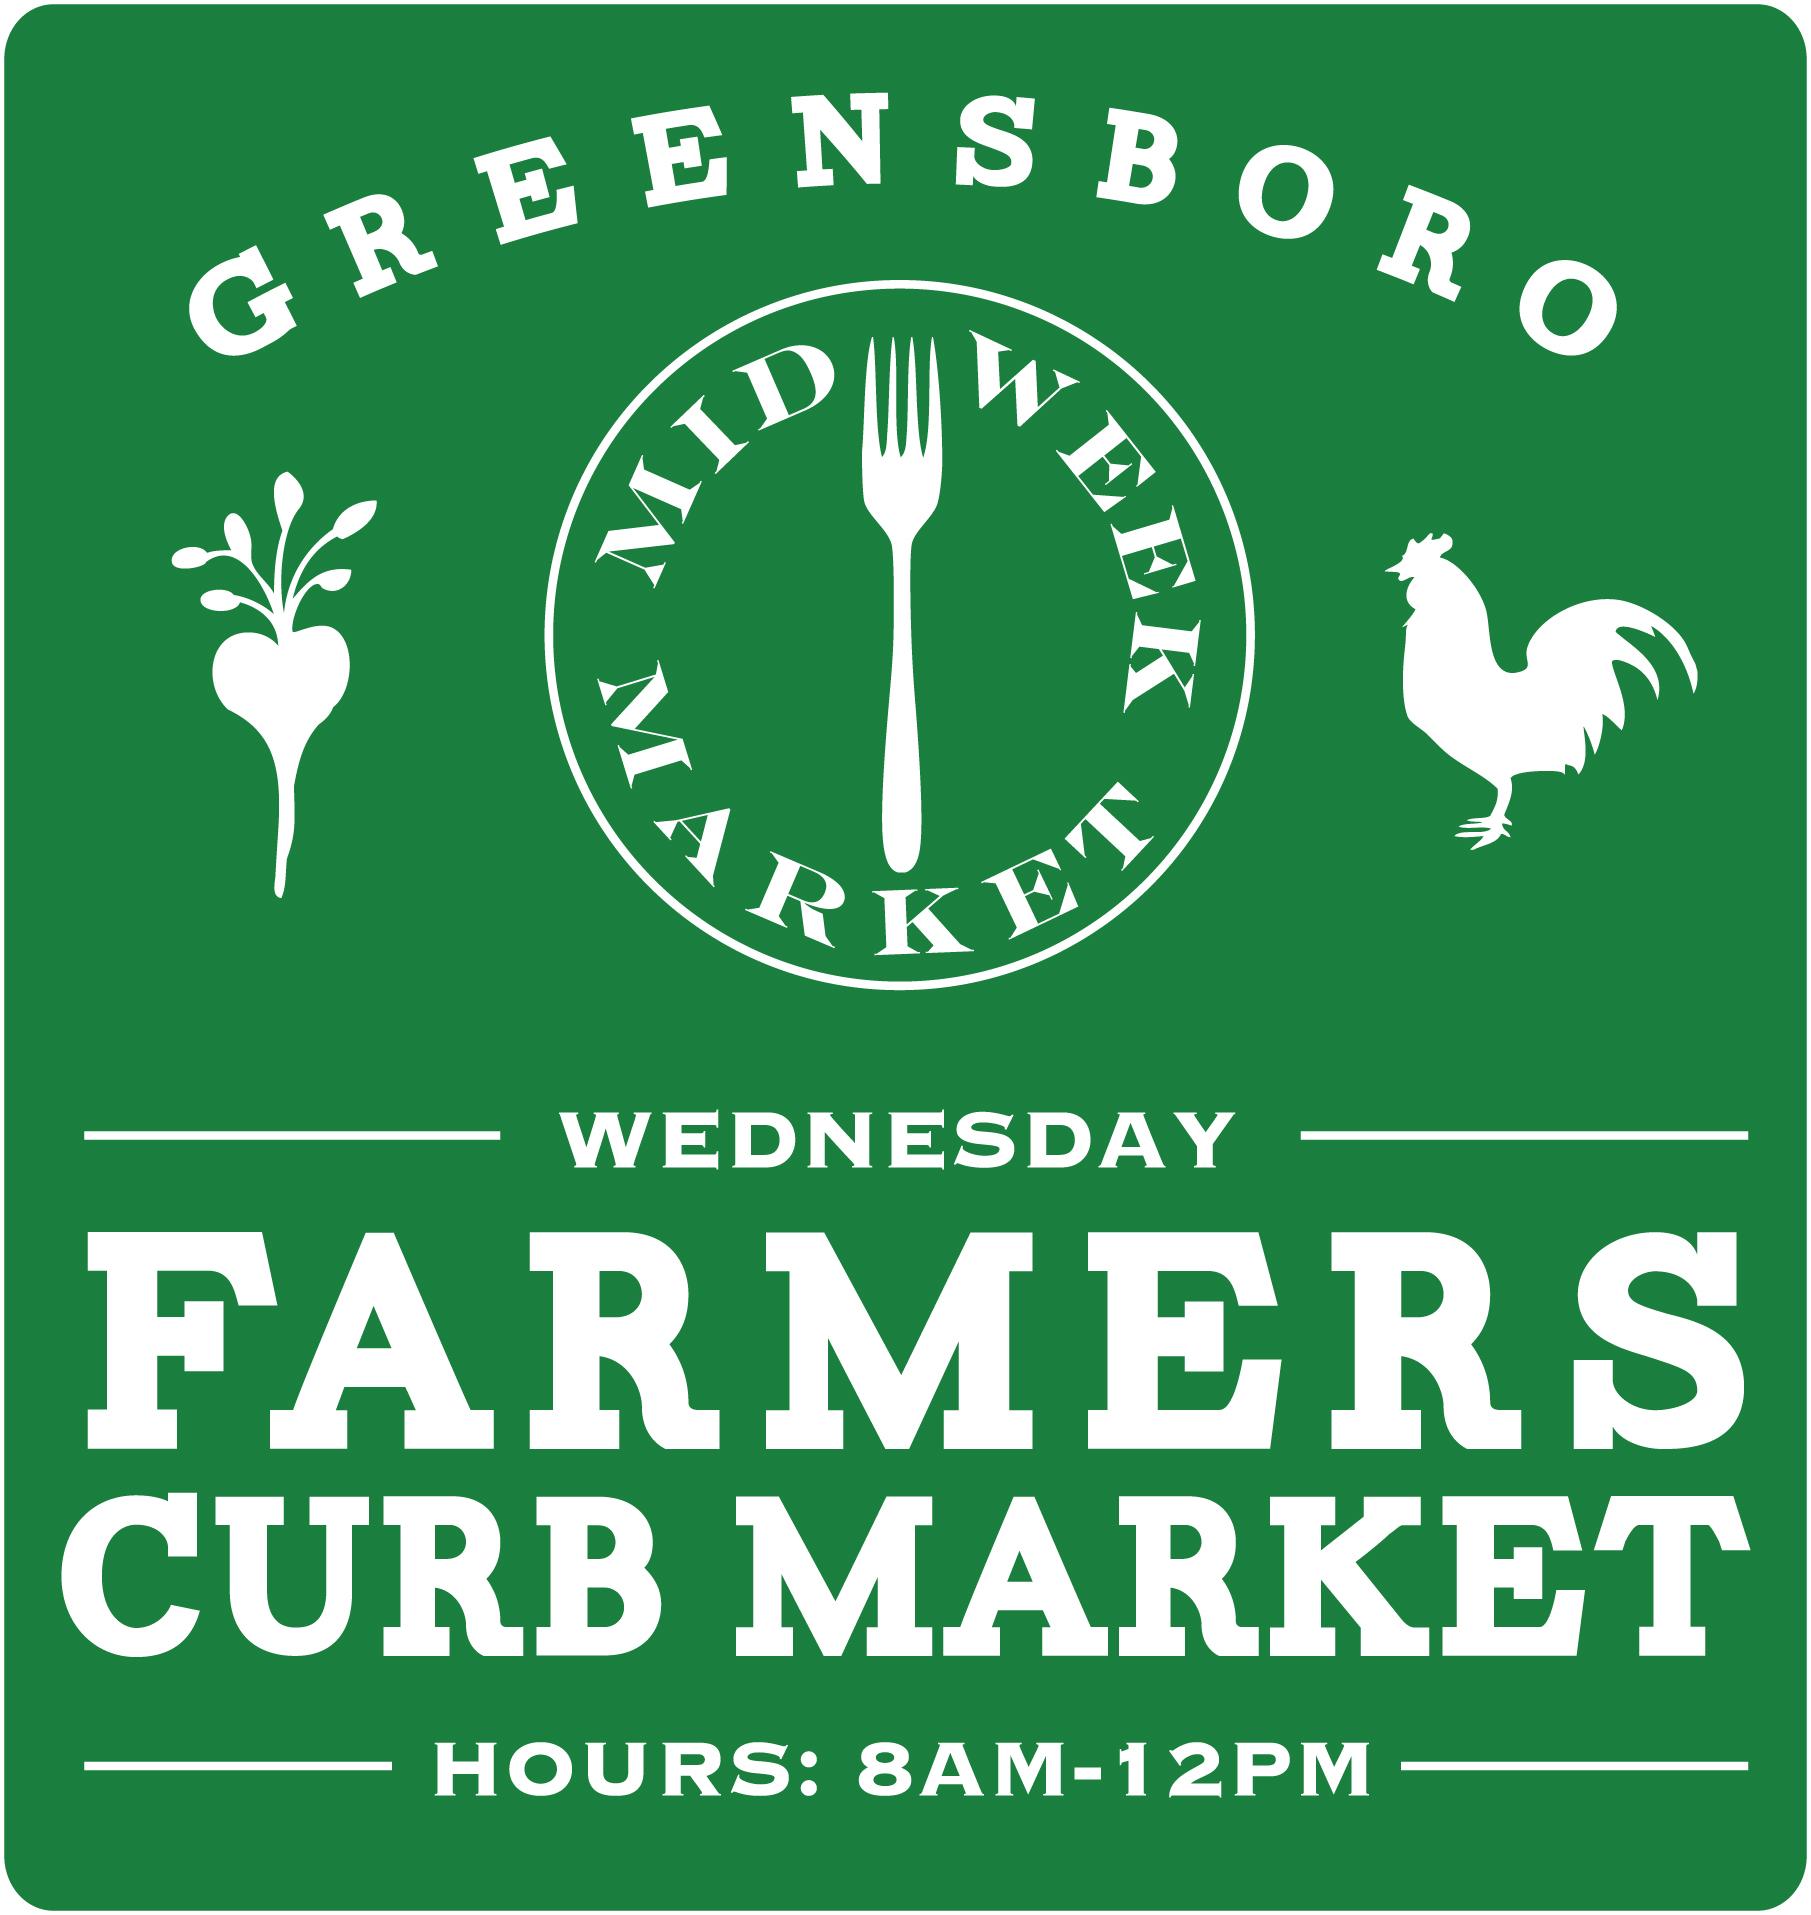 Our News | Greensboro Farmers Curb Market